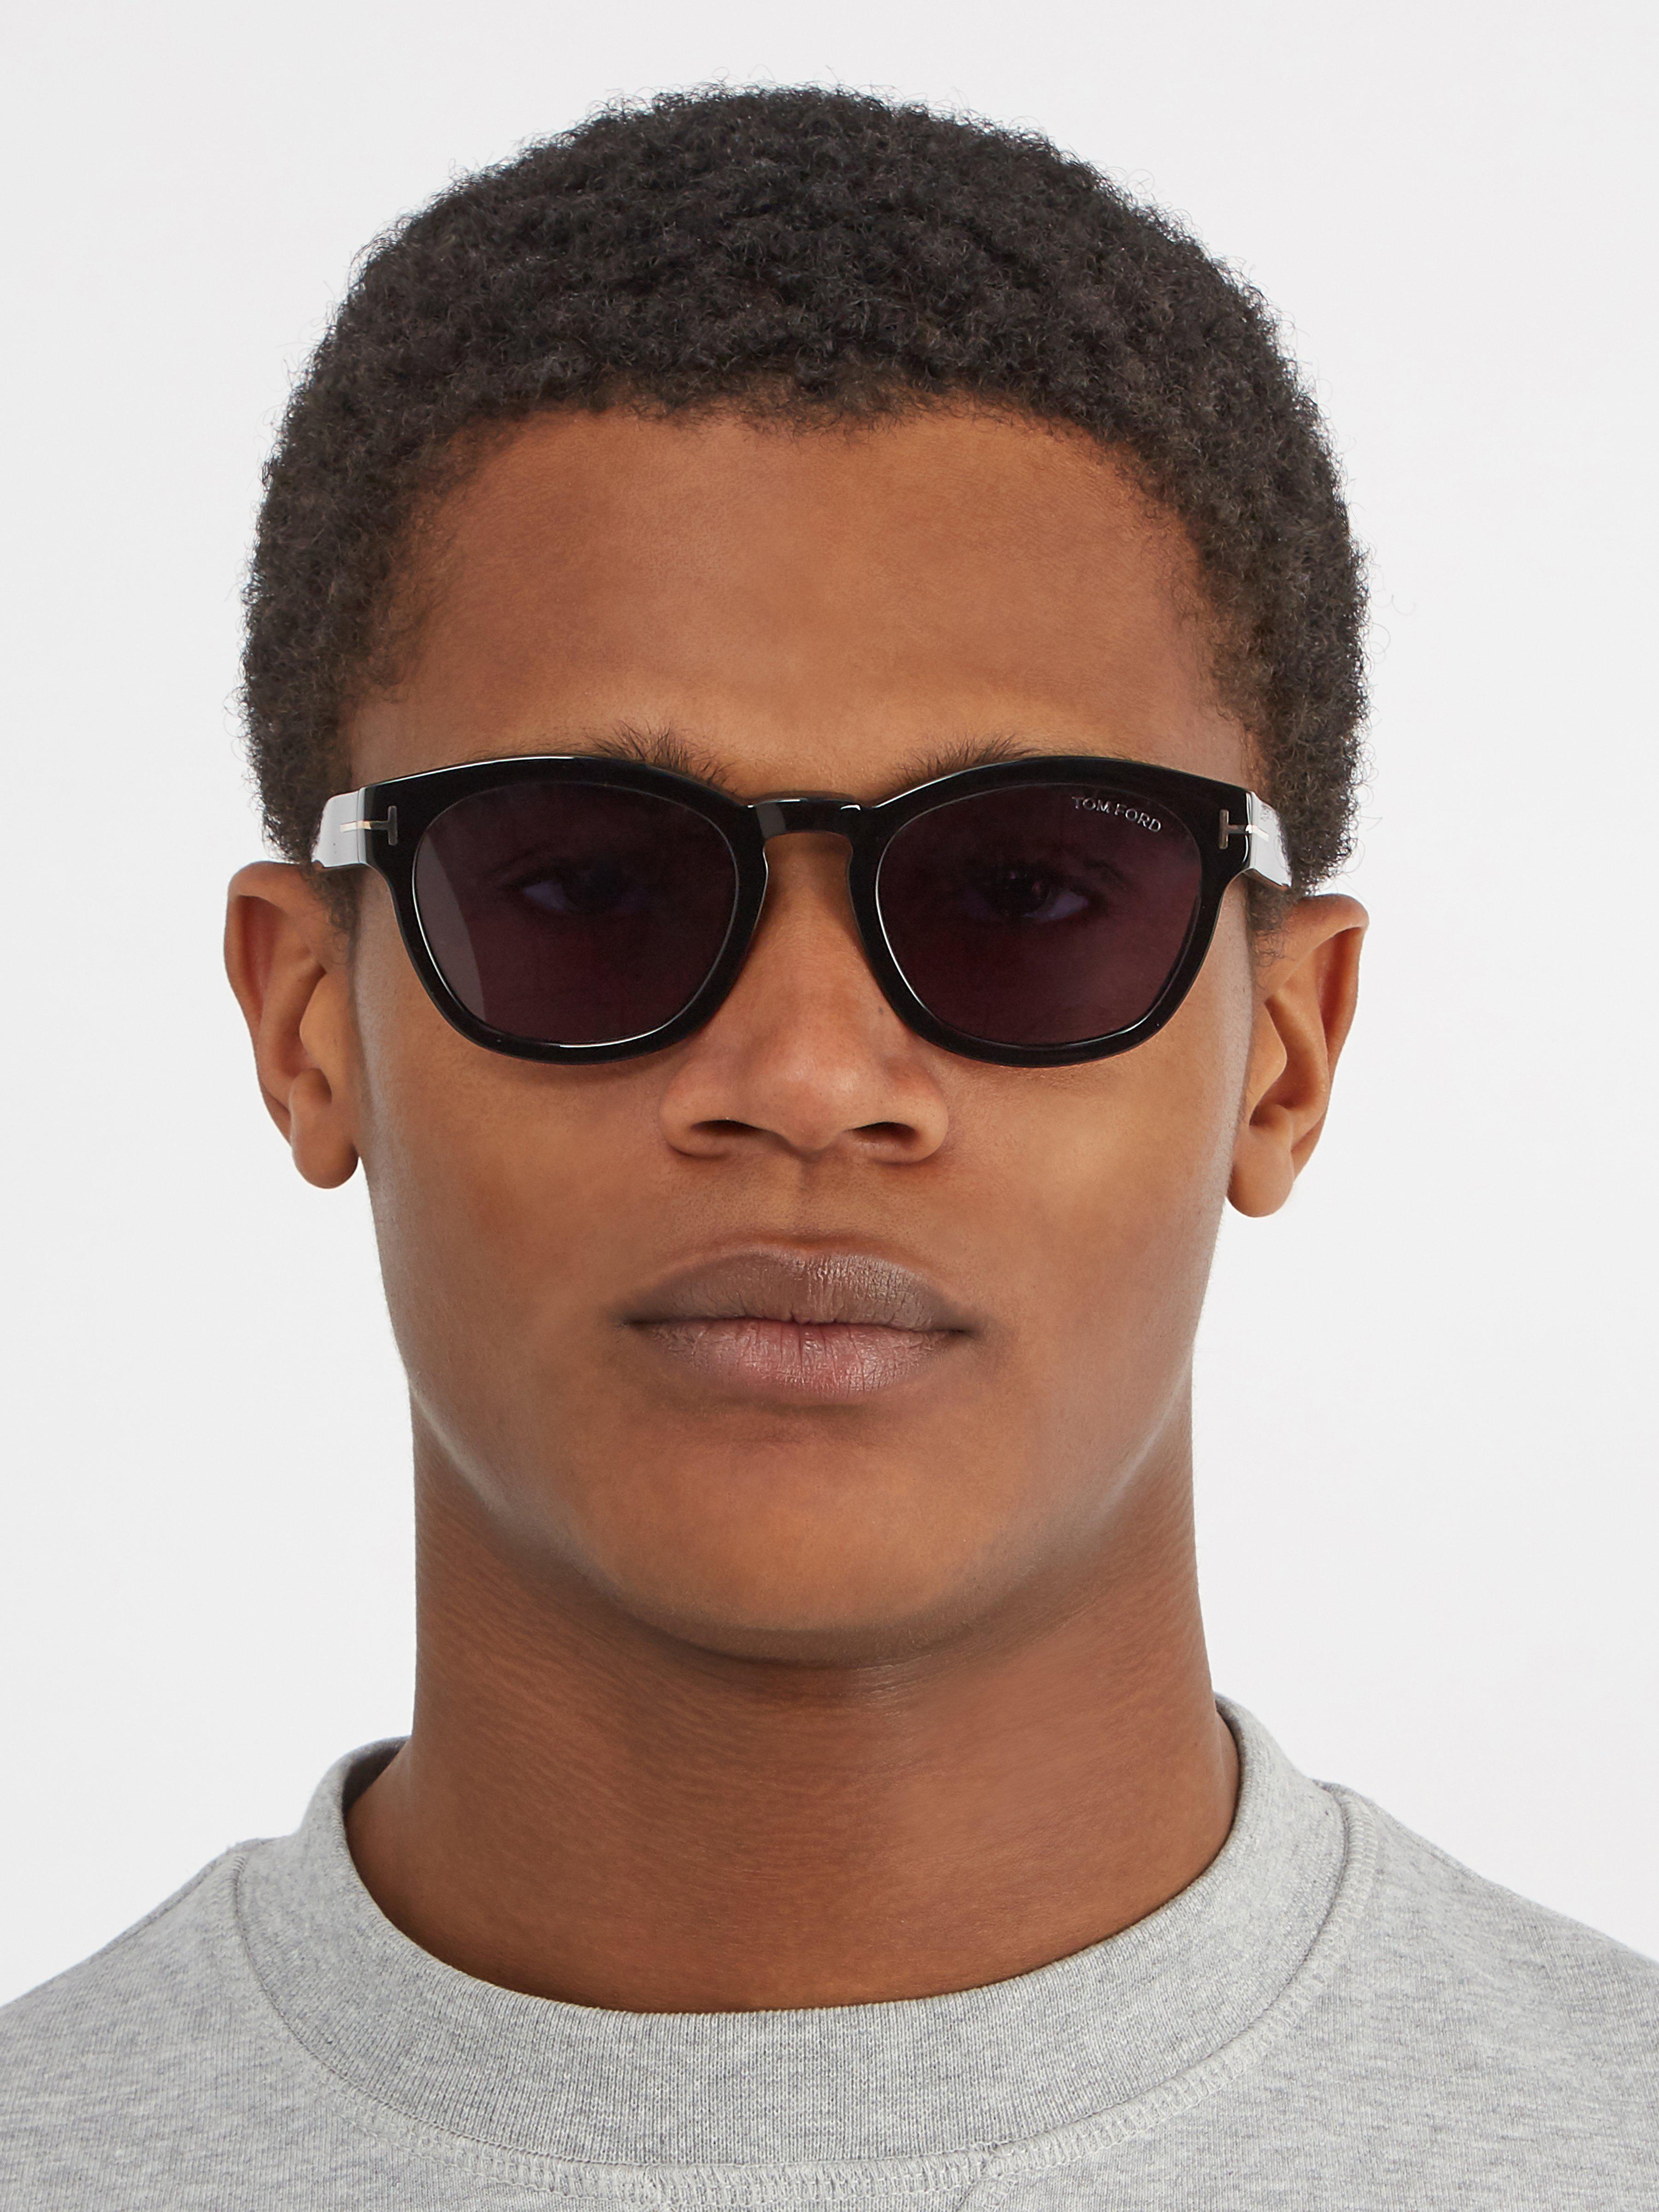 6fe4ee46a5 Tom Ford - Black Bryan Square Frame Sunglasses for Men - Lyst. View  fullscreen